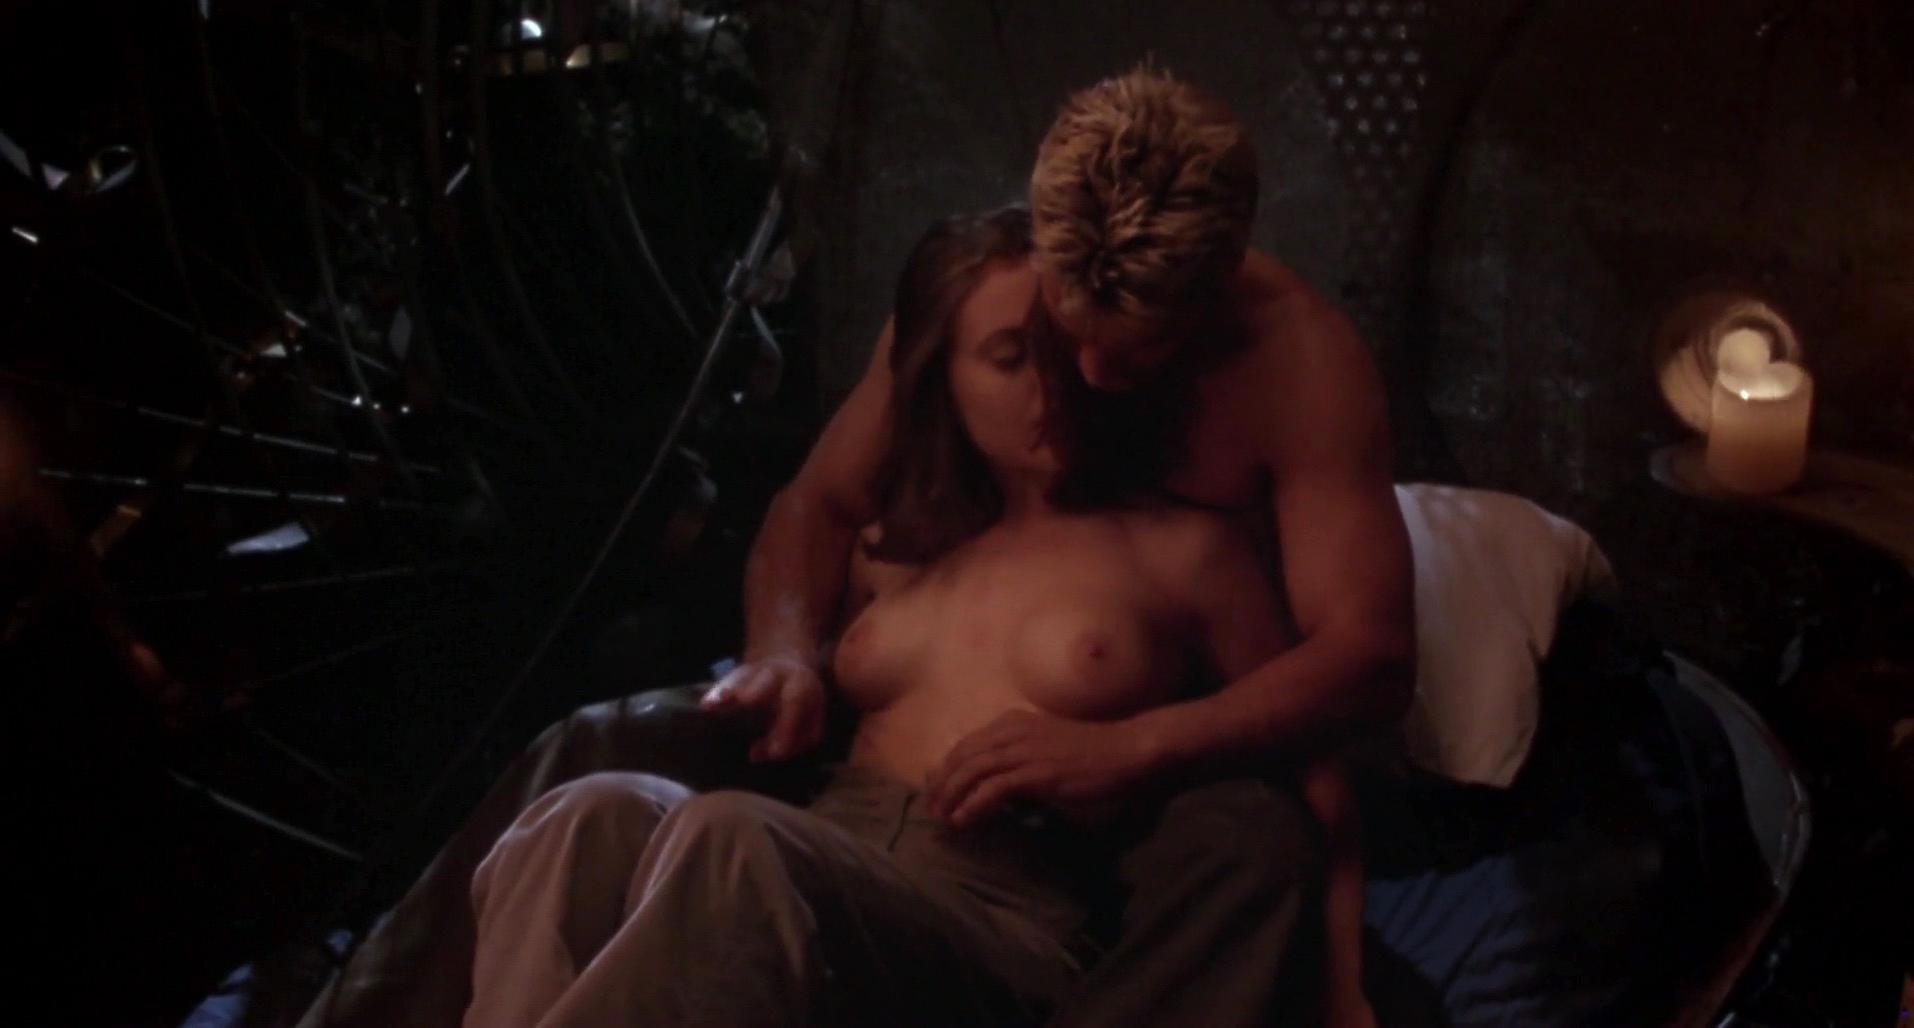 Alyssa milano hot sex gif, amatuer nude photo of woman with a mohawk